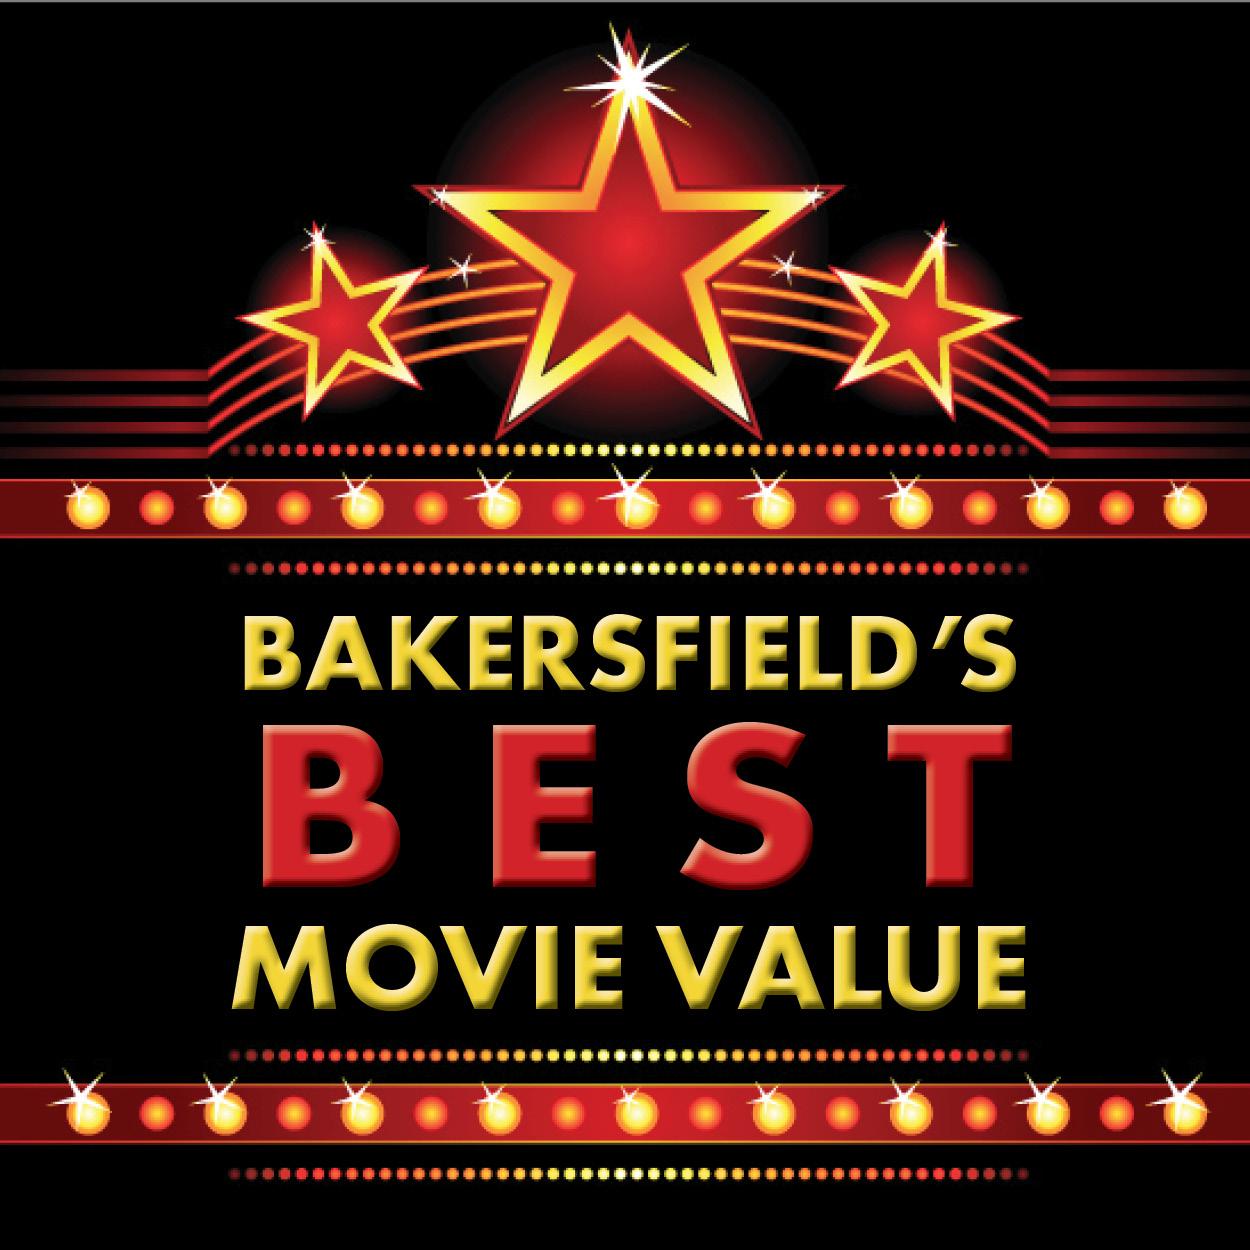 Bakersfield's Best Movie Value